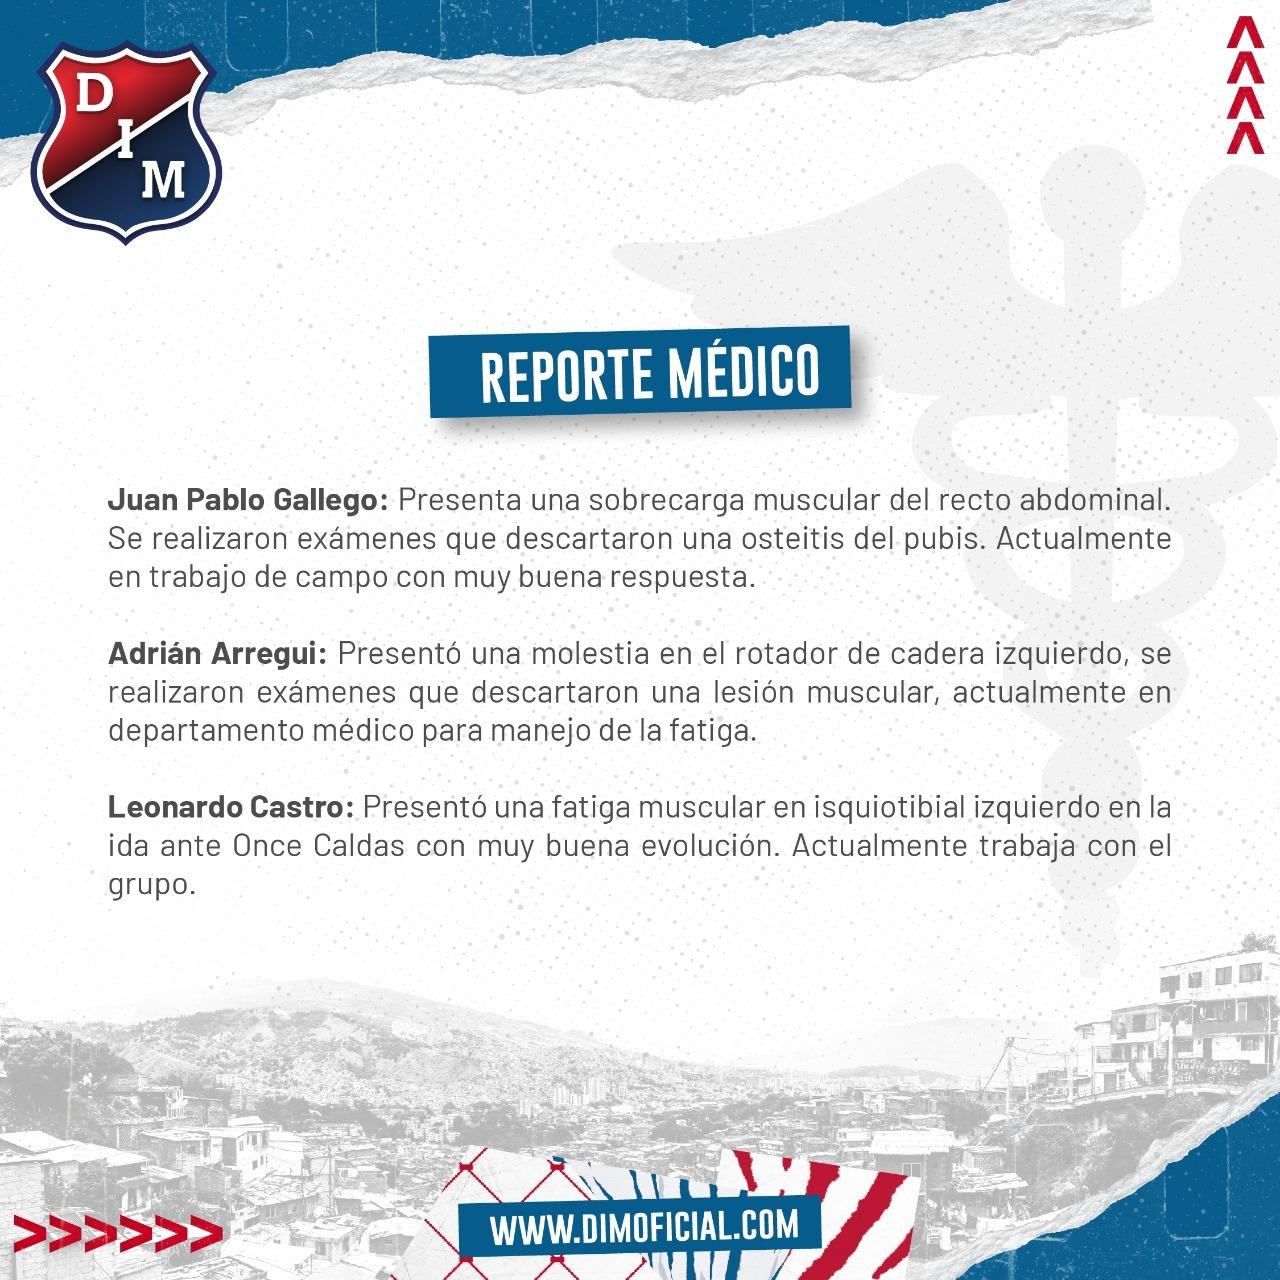 Reporte medico Medellin